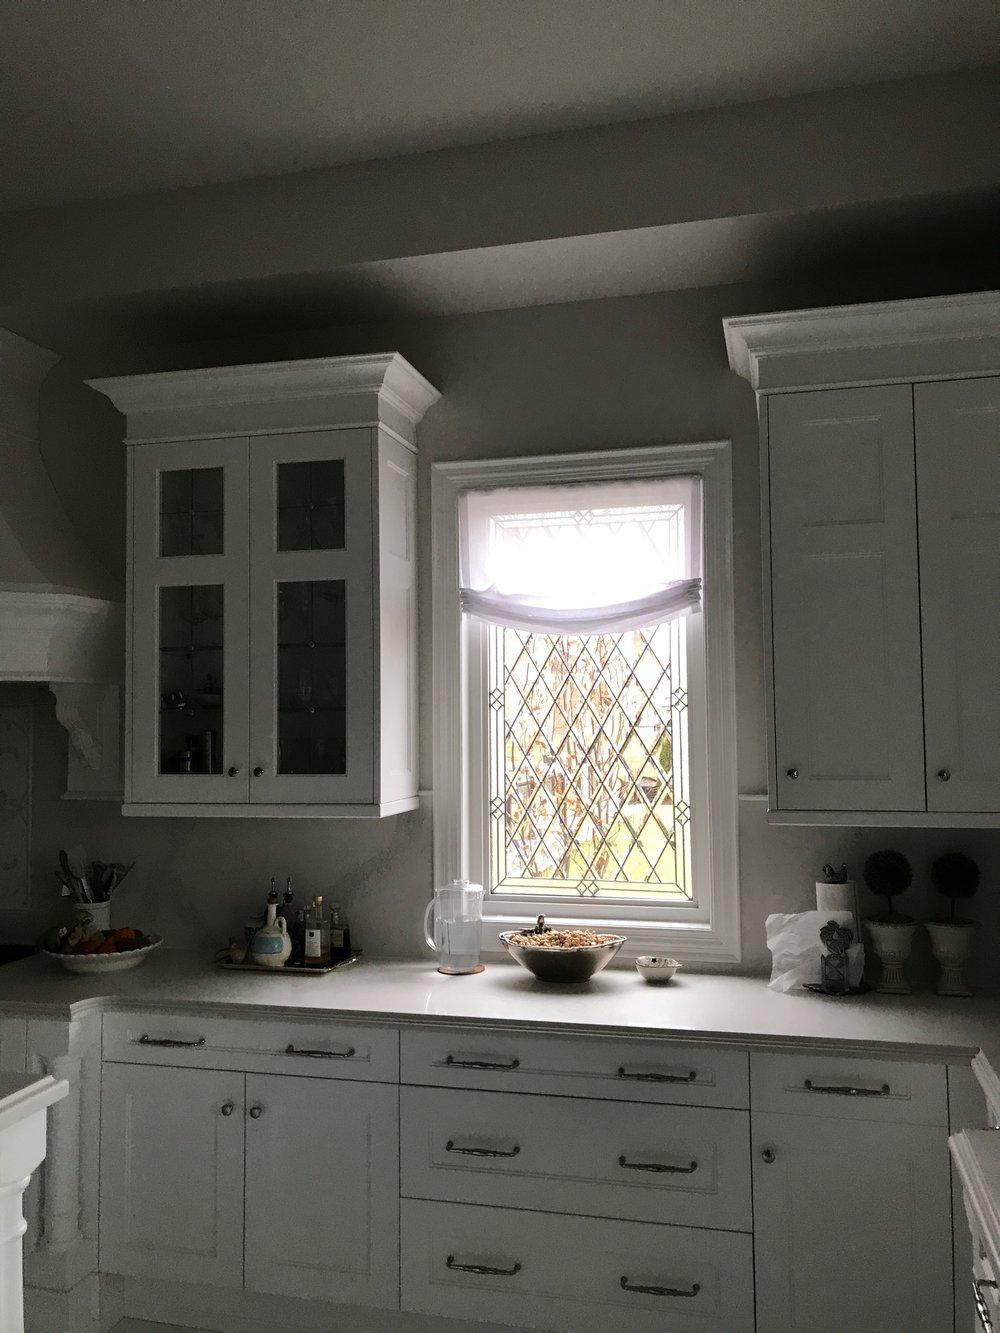 cookstown-decorative-glass-door-inserts-king-city-ontario